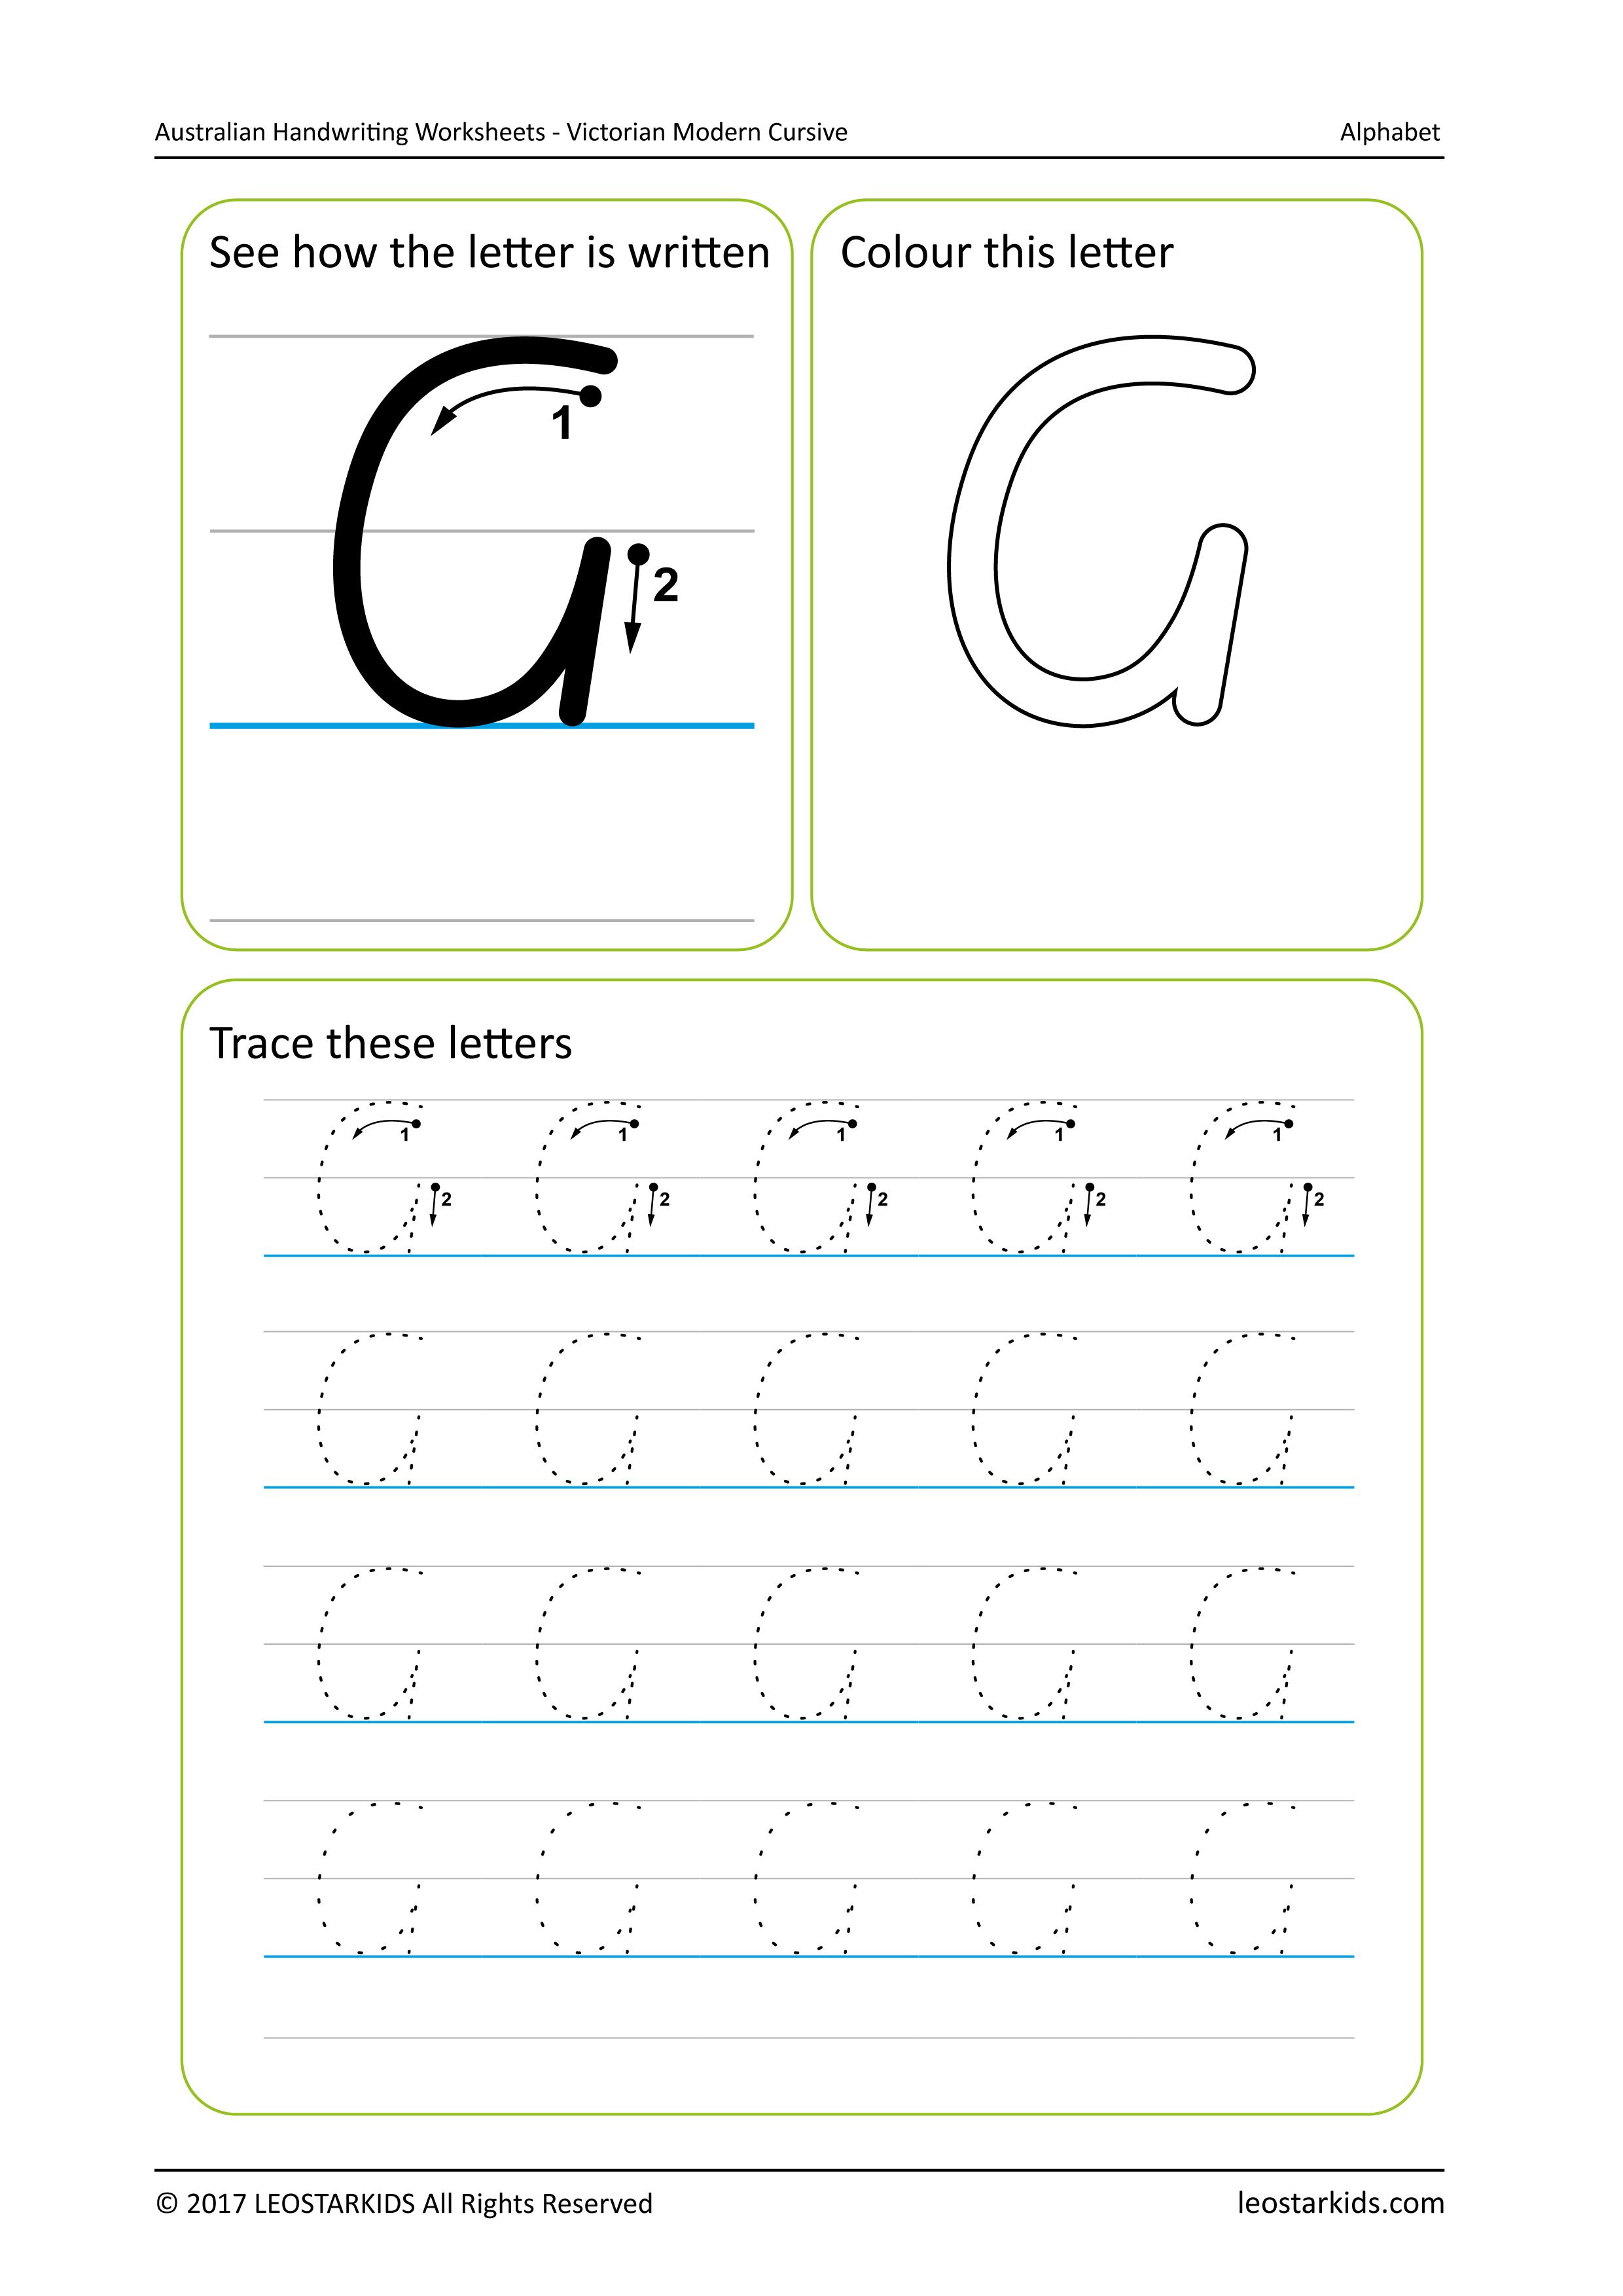 Worksheet ~ Cursive Handwriting Stepfor Beginners with Alphabet Handwriting Worksheets Twinkl